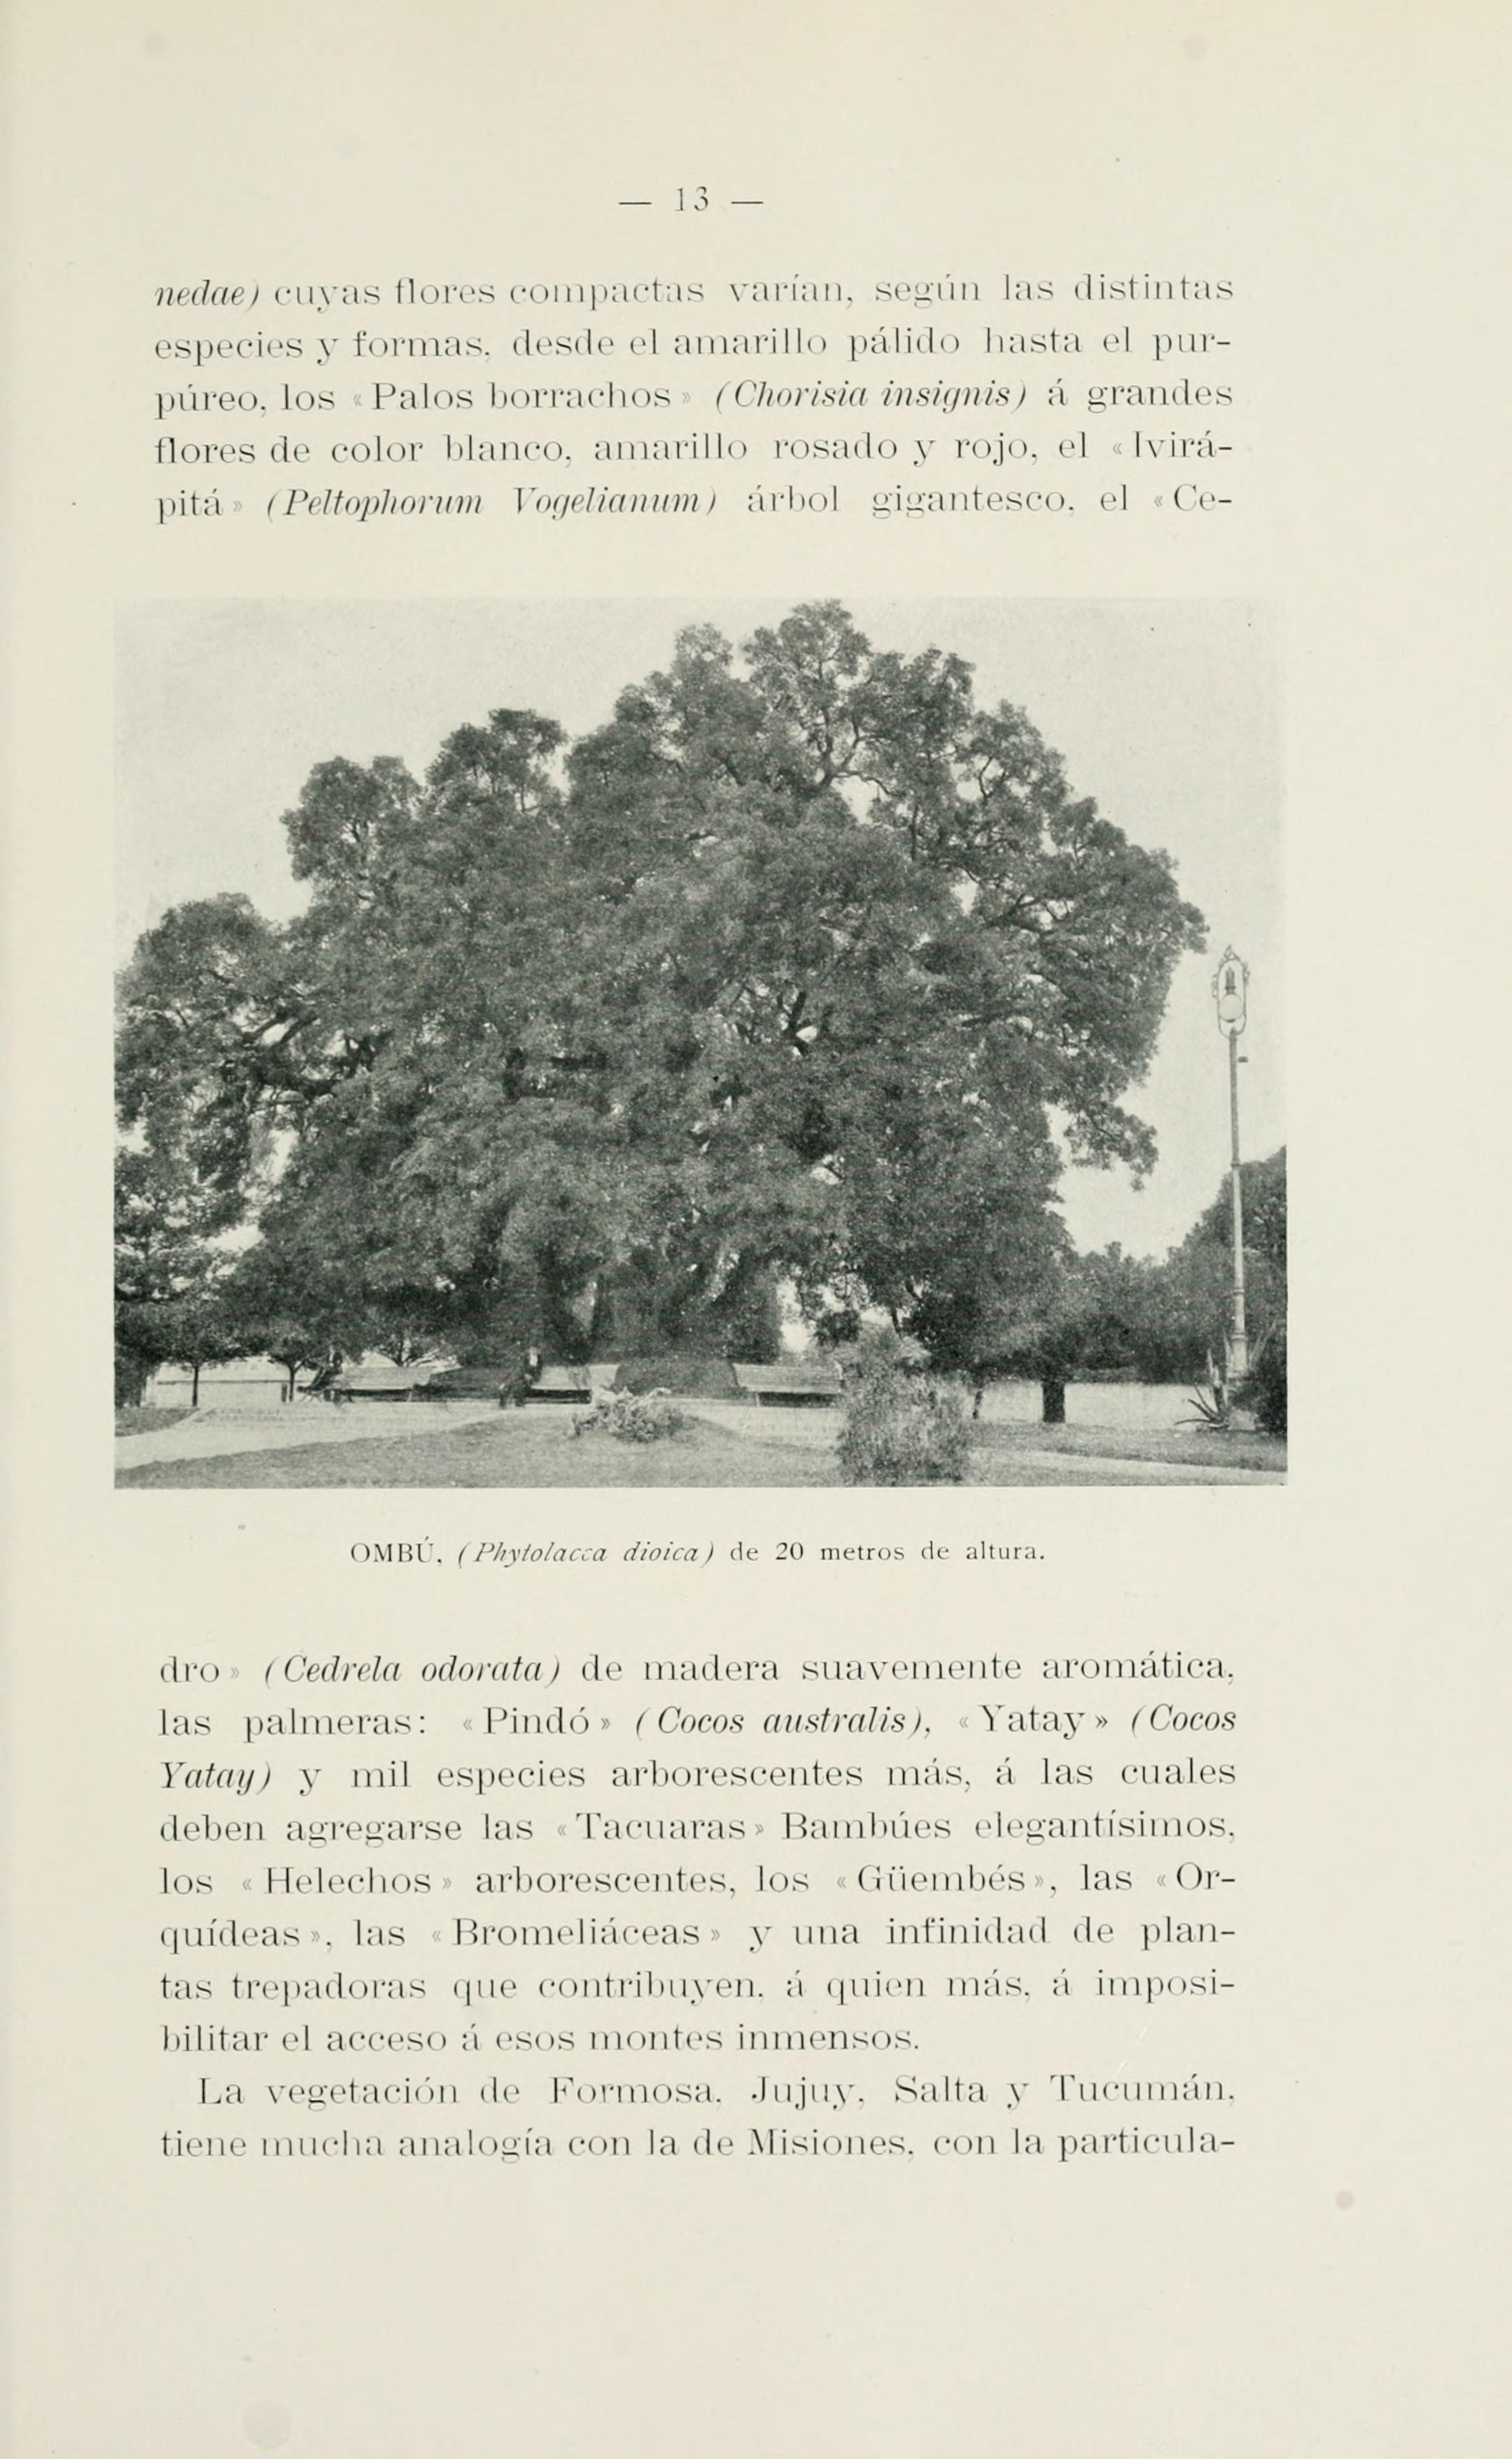 File El Jardín Botánico De Buenos Aires Page 13 Bhl16635336 Jpg Wikimedia Commons